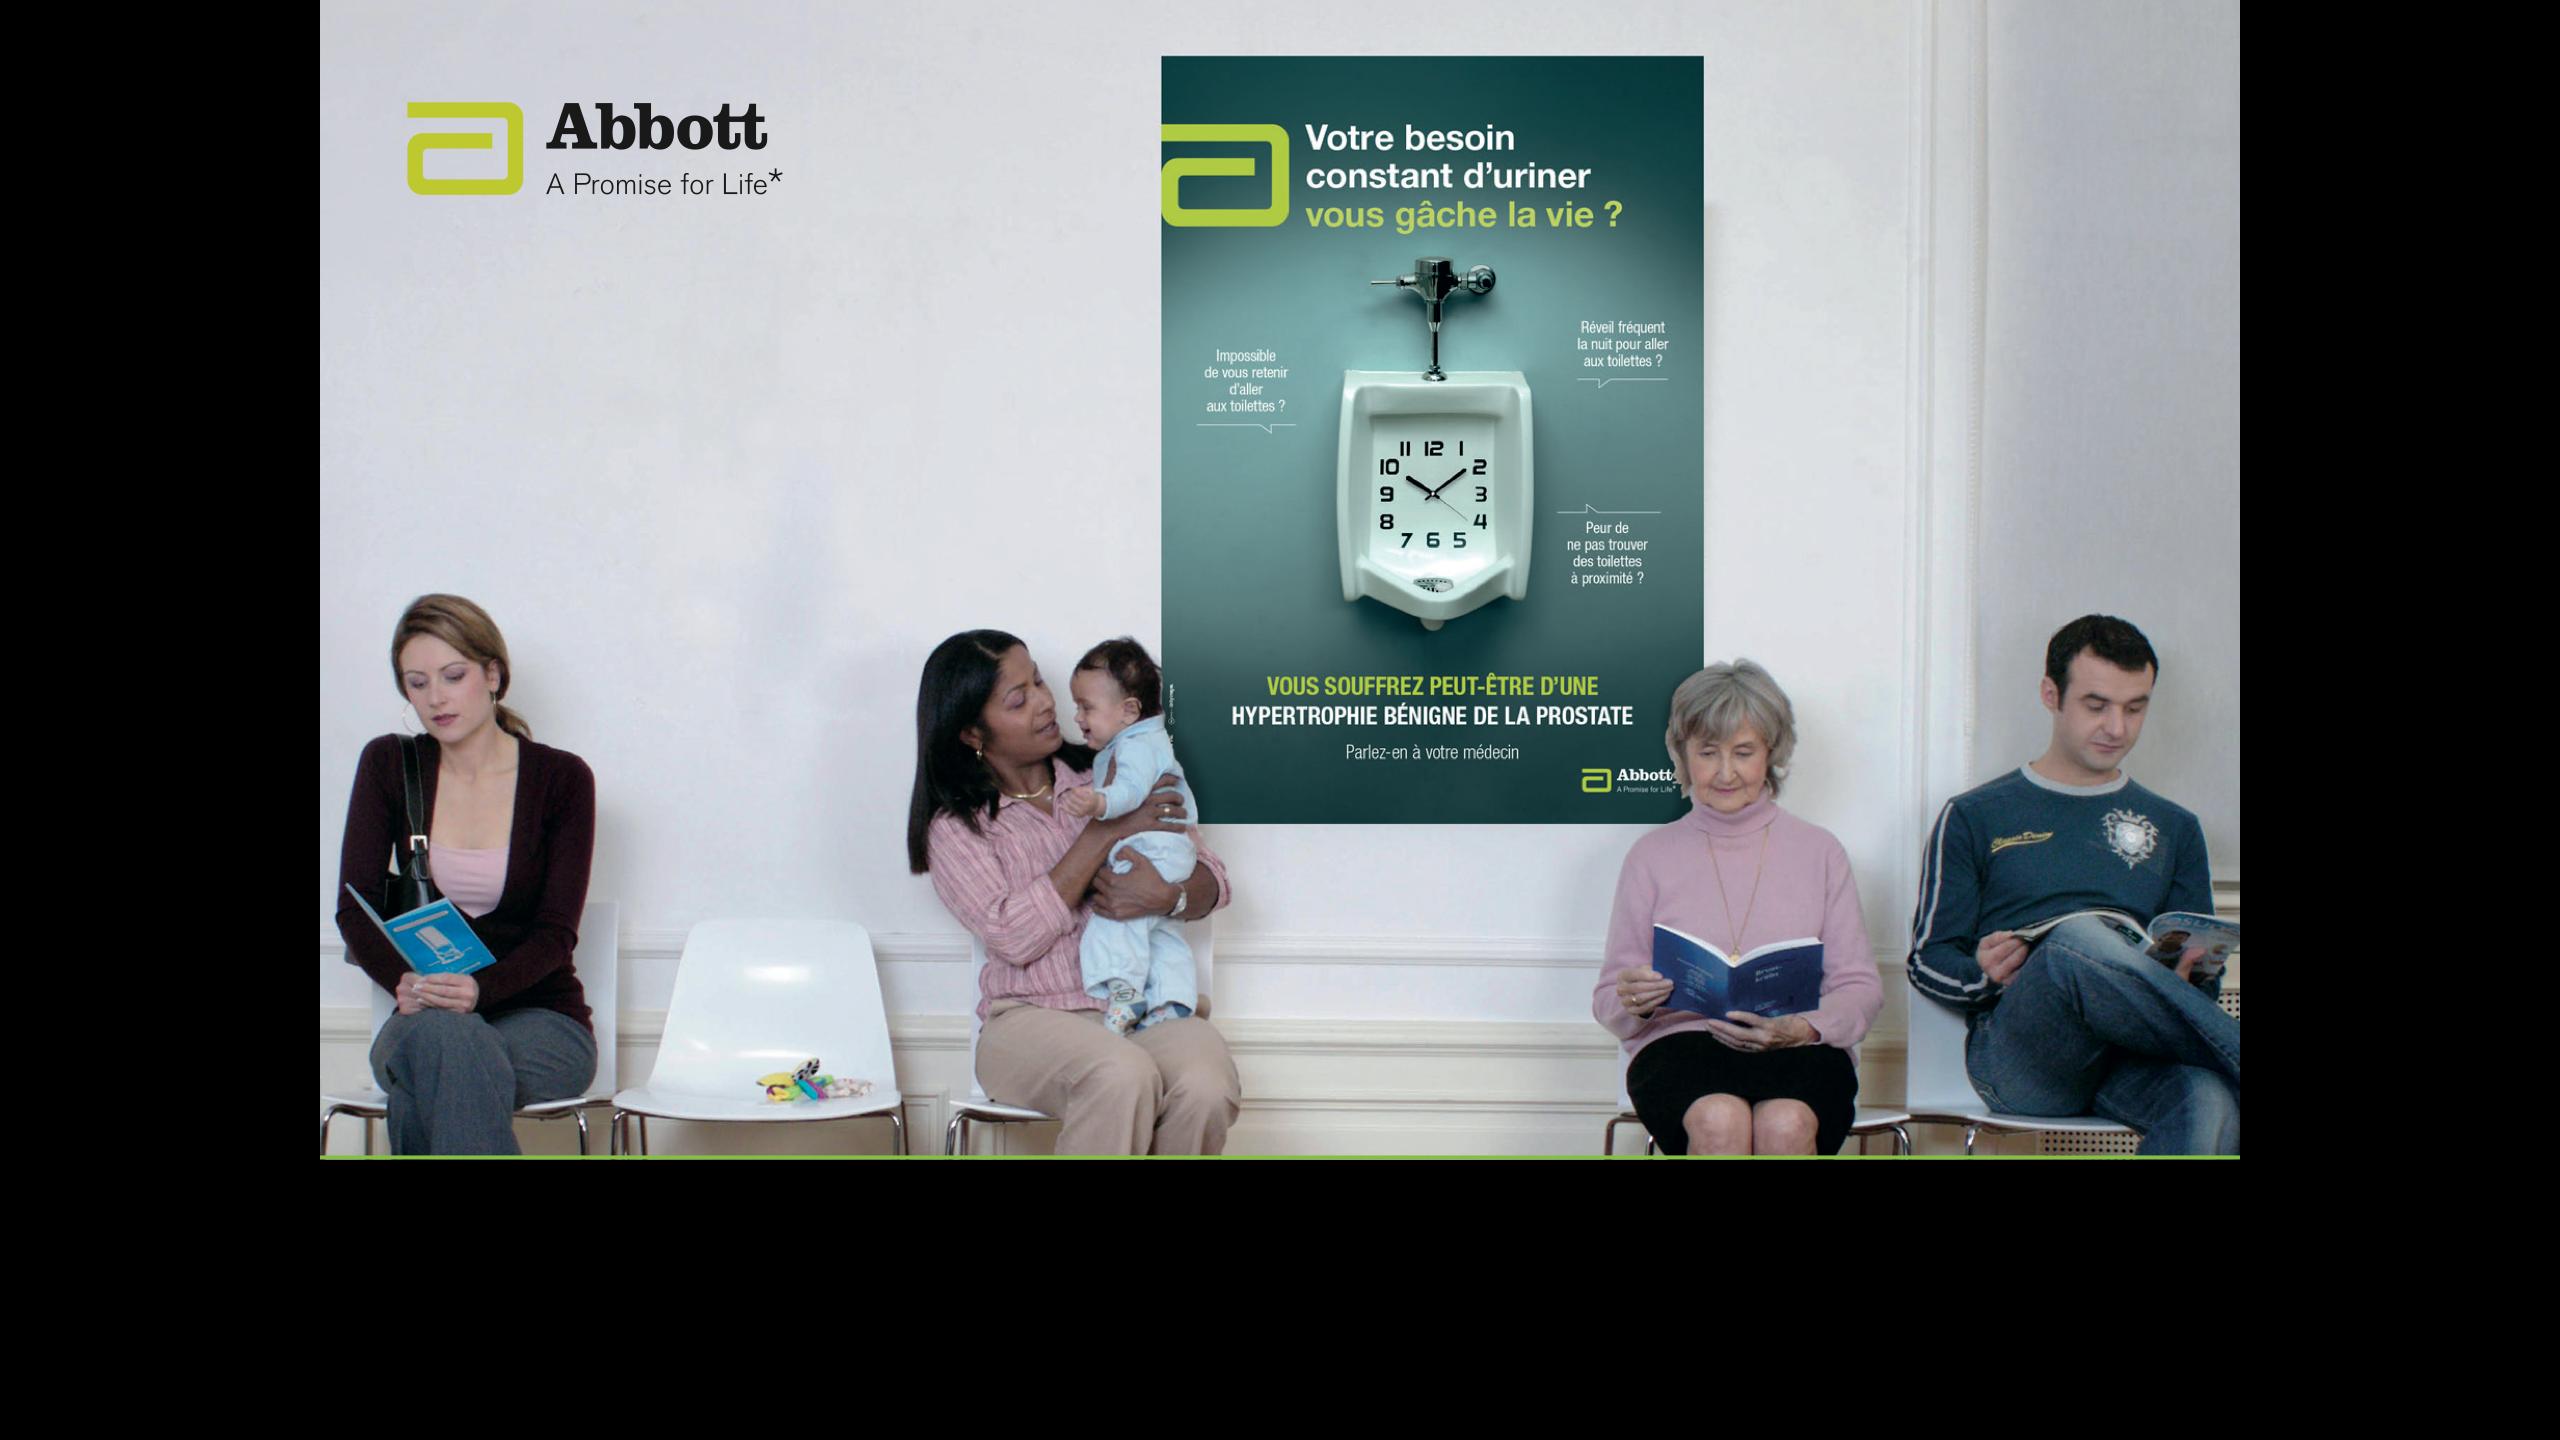 environnement Abbott by agency